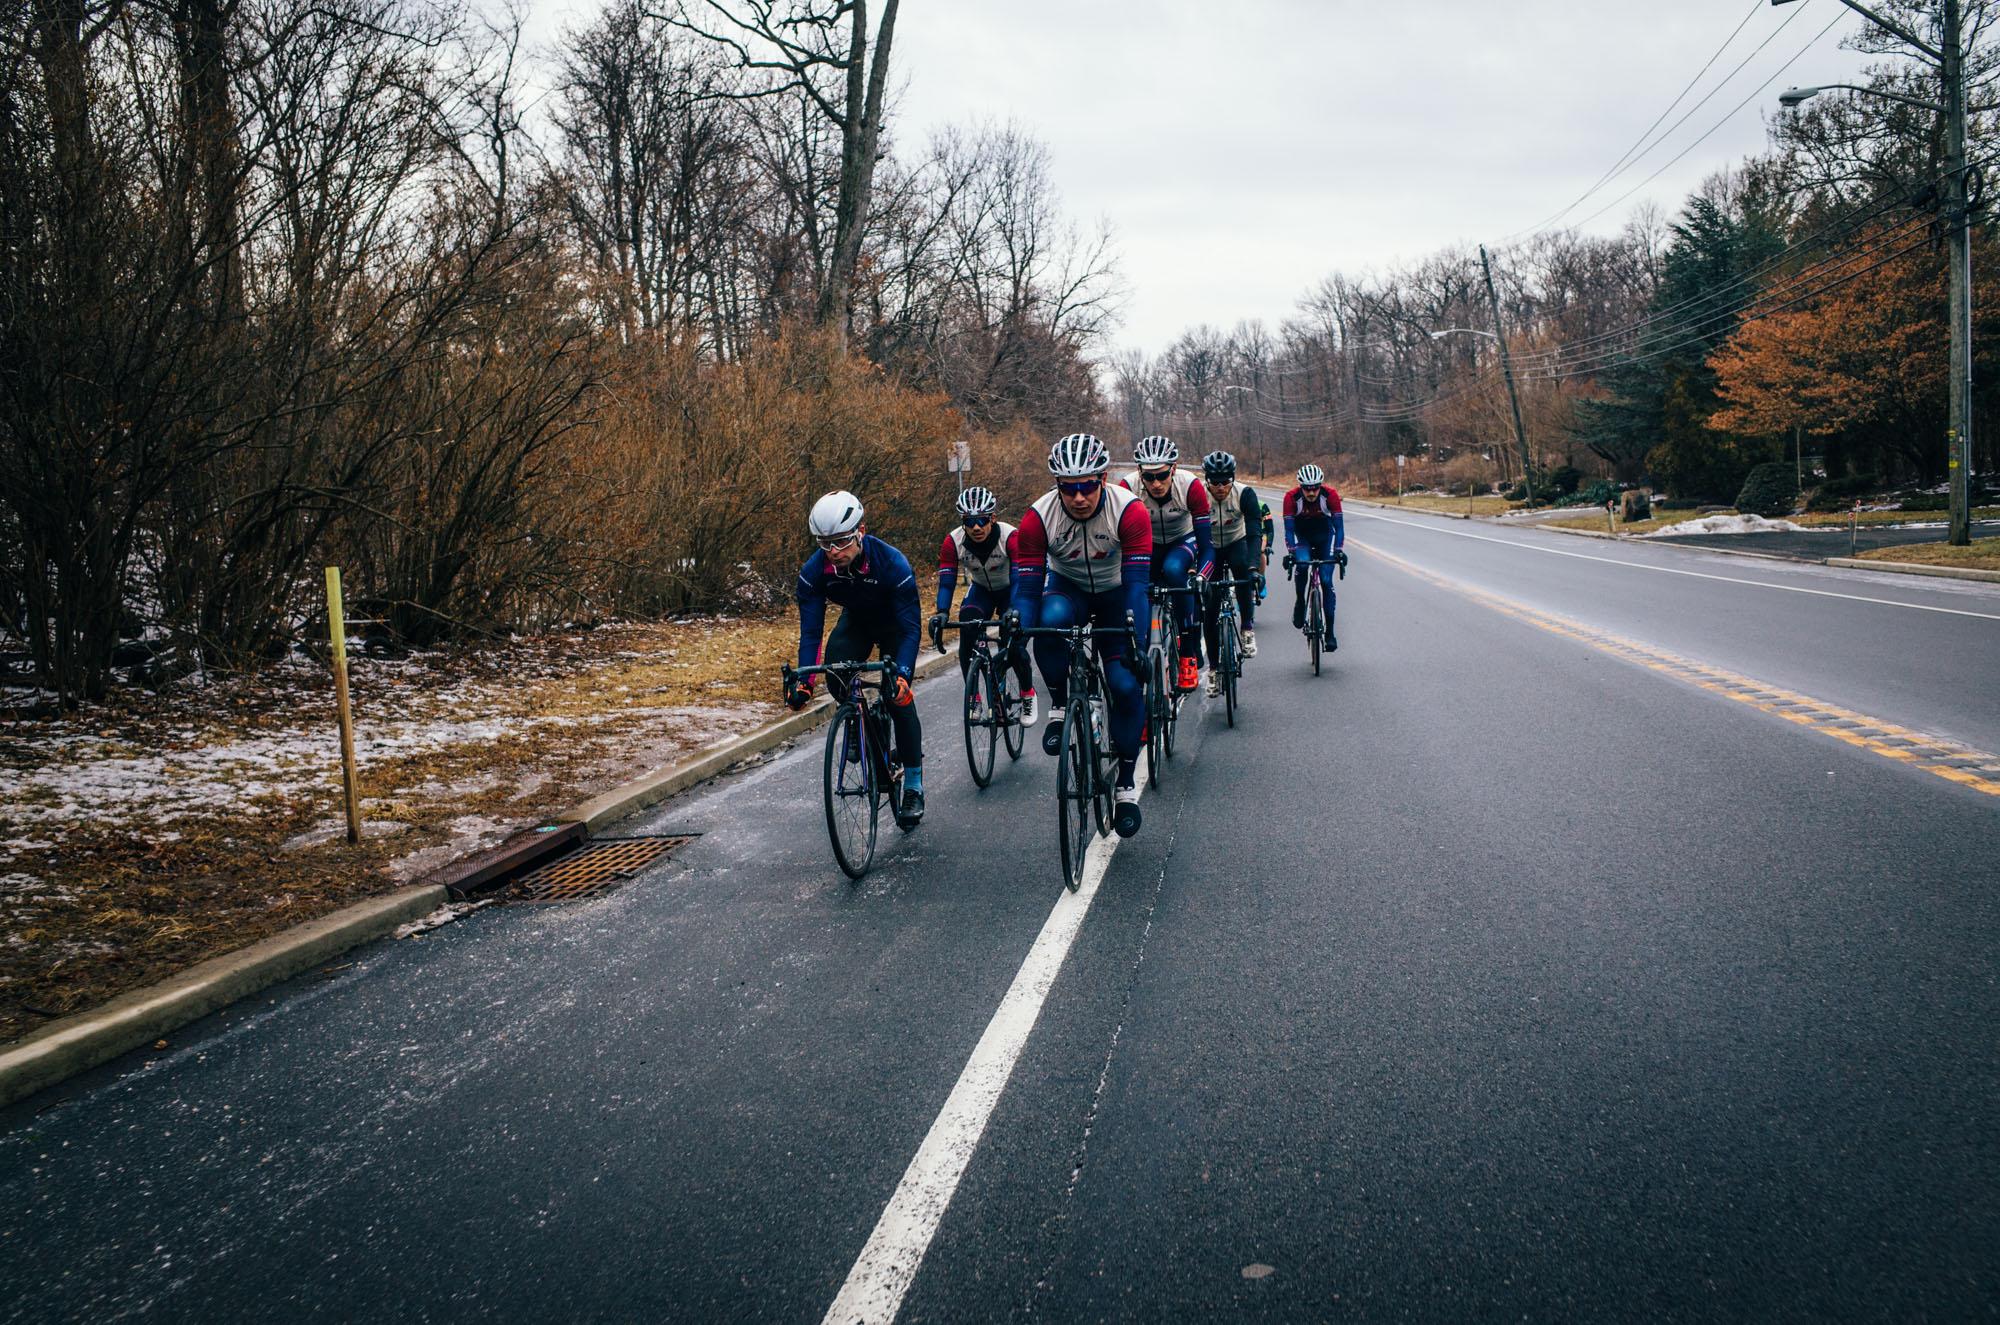 to-be-determined-photo-rhetoric-weekend-roll-lisa-bday-ride-107.jpg